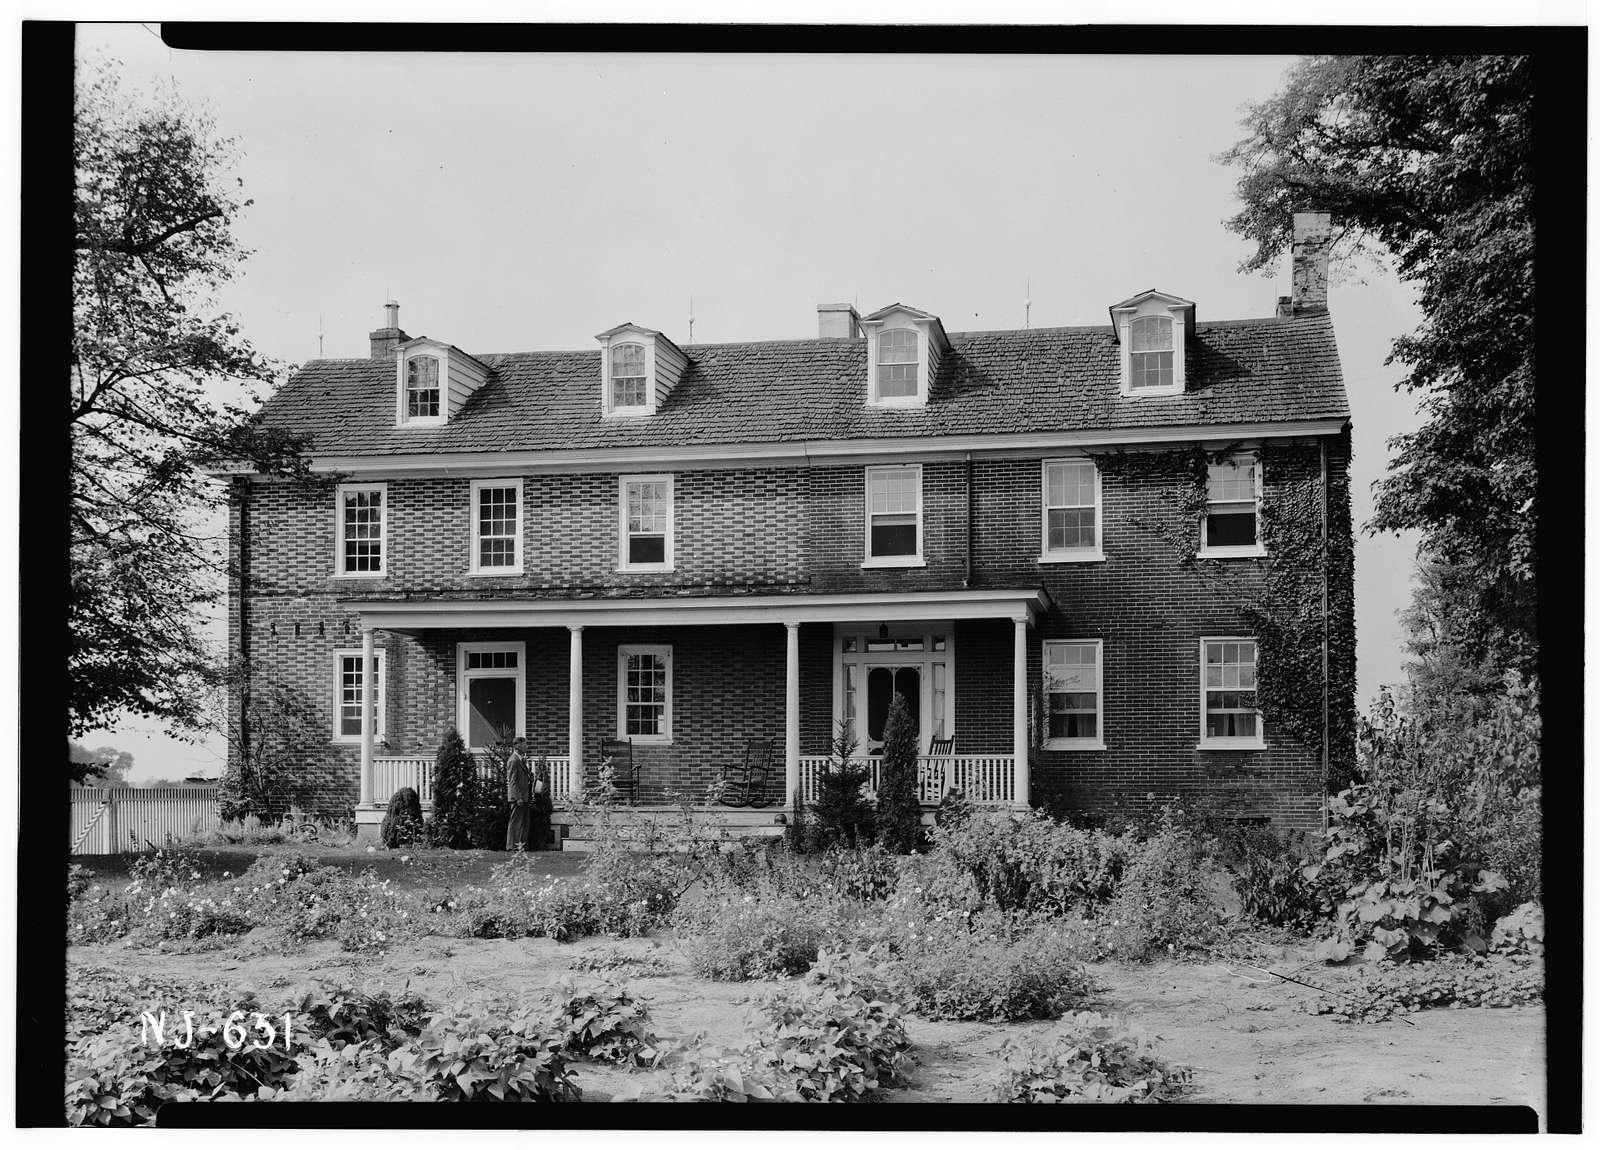 Jacob Merritt House, Springfield, Burlington County, NJ